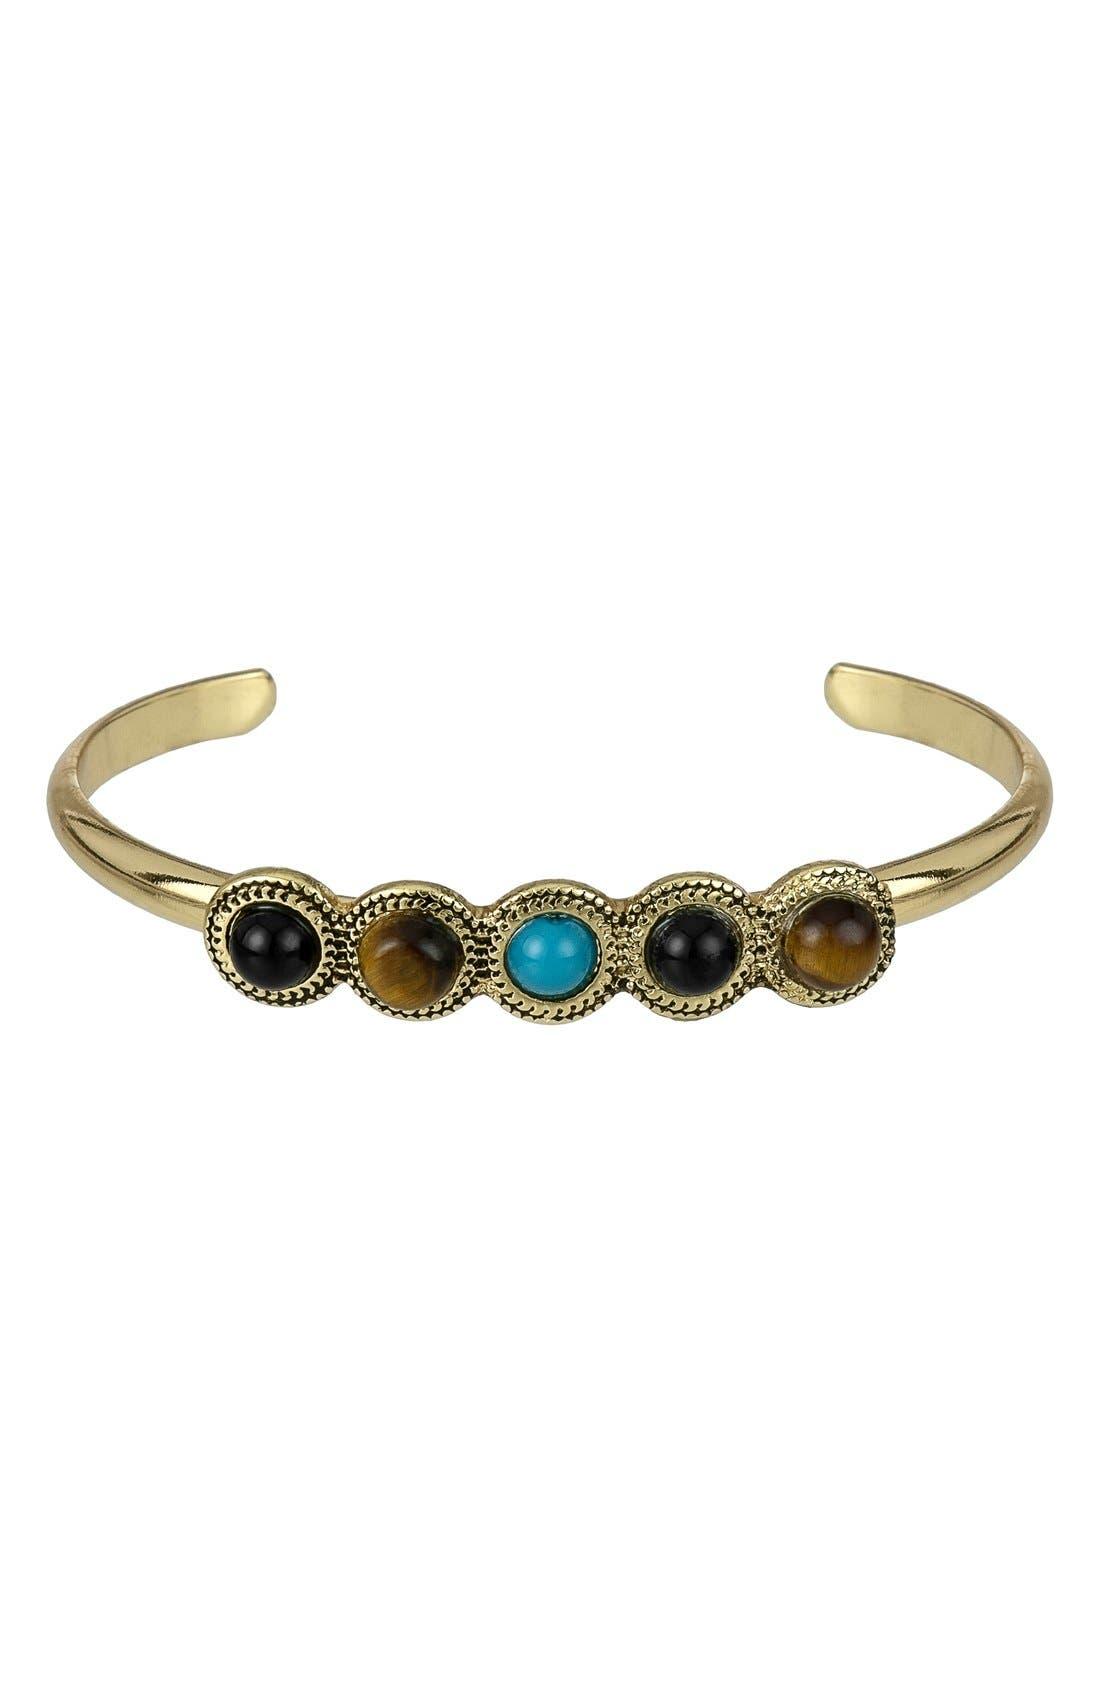 Alternate Image 1 Selected - Sam Edelman Stone Cuff Bracelet